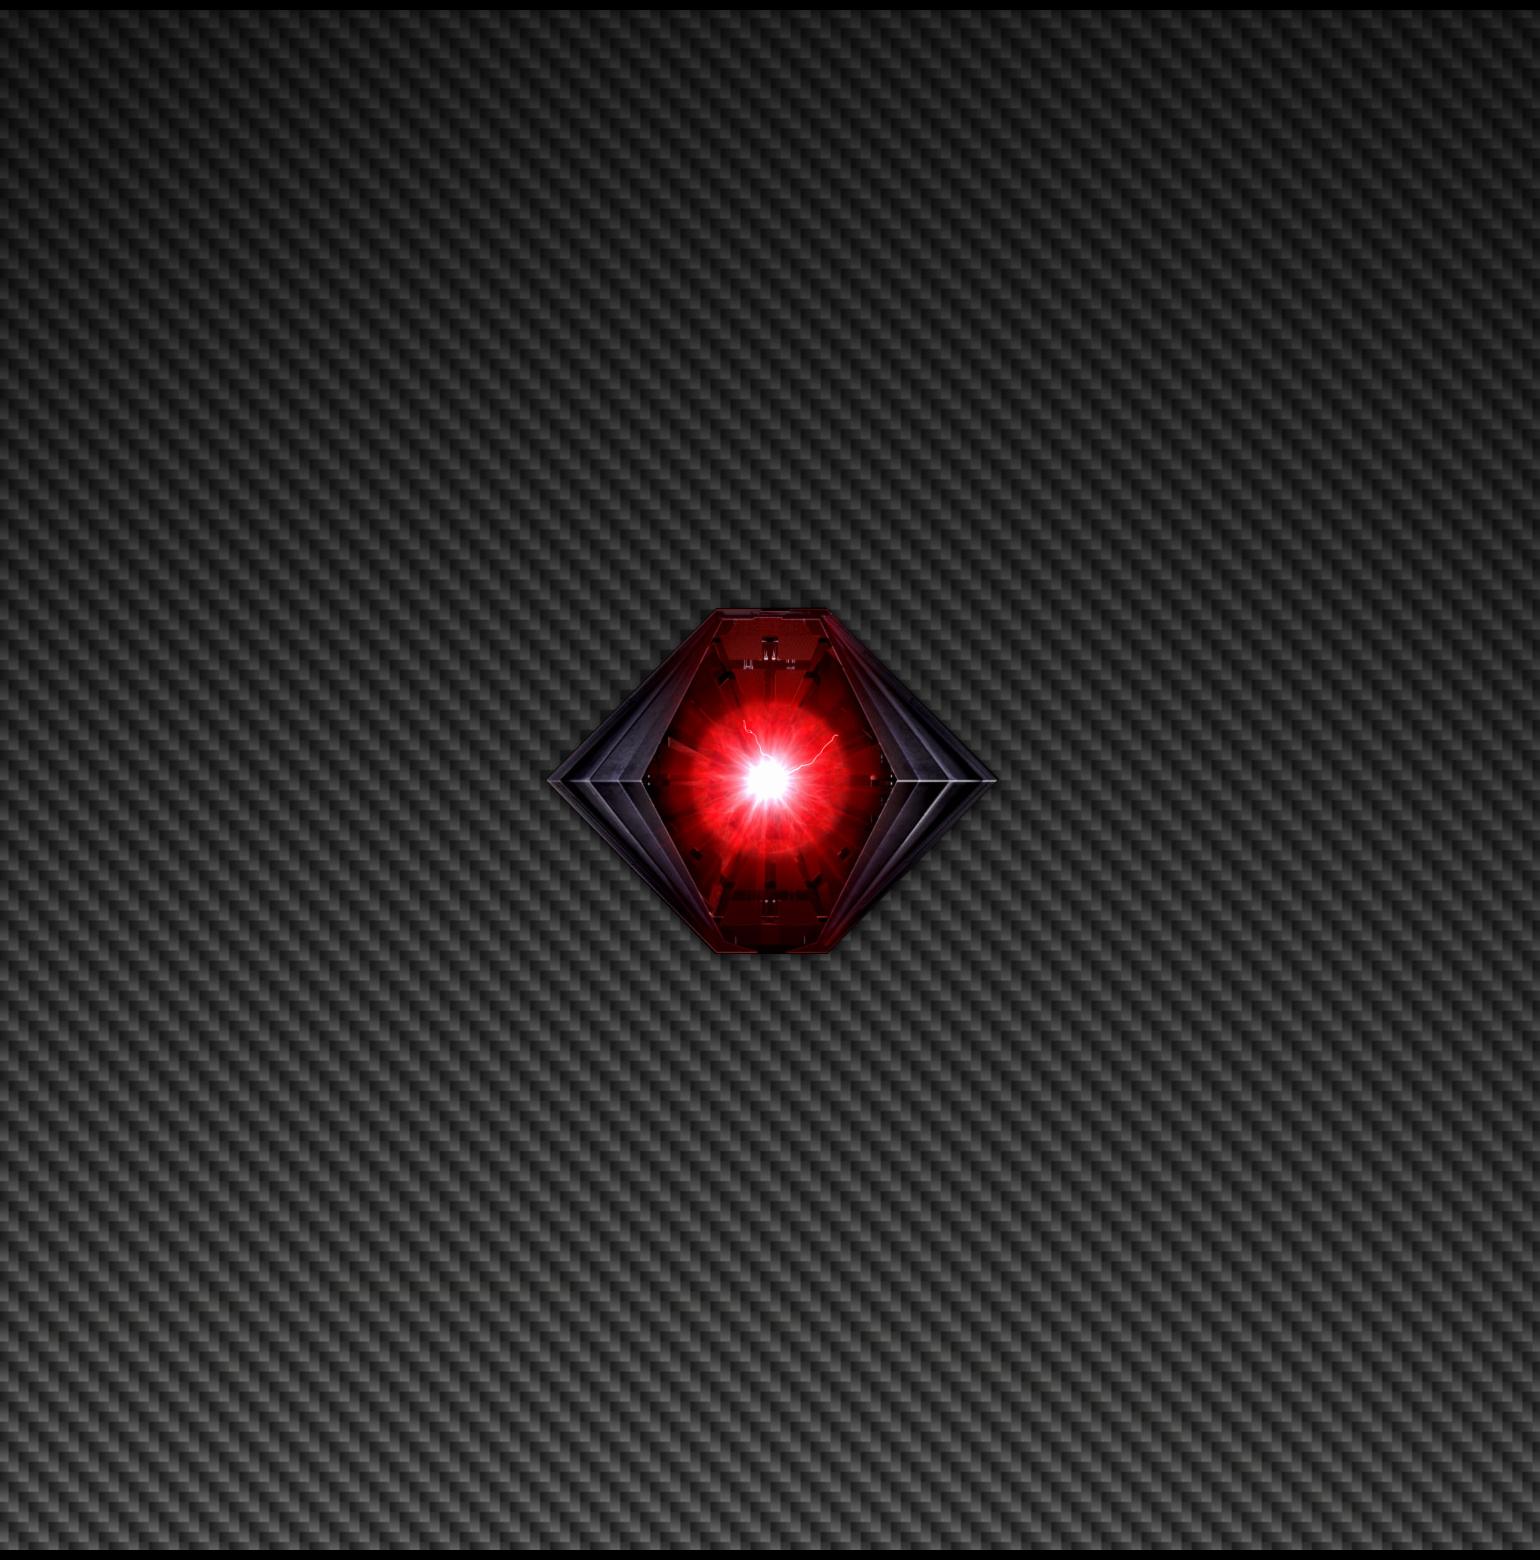 droid razr m verizon wireless